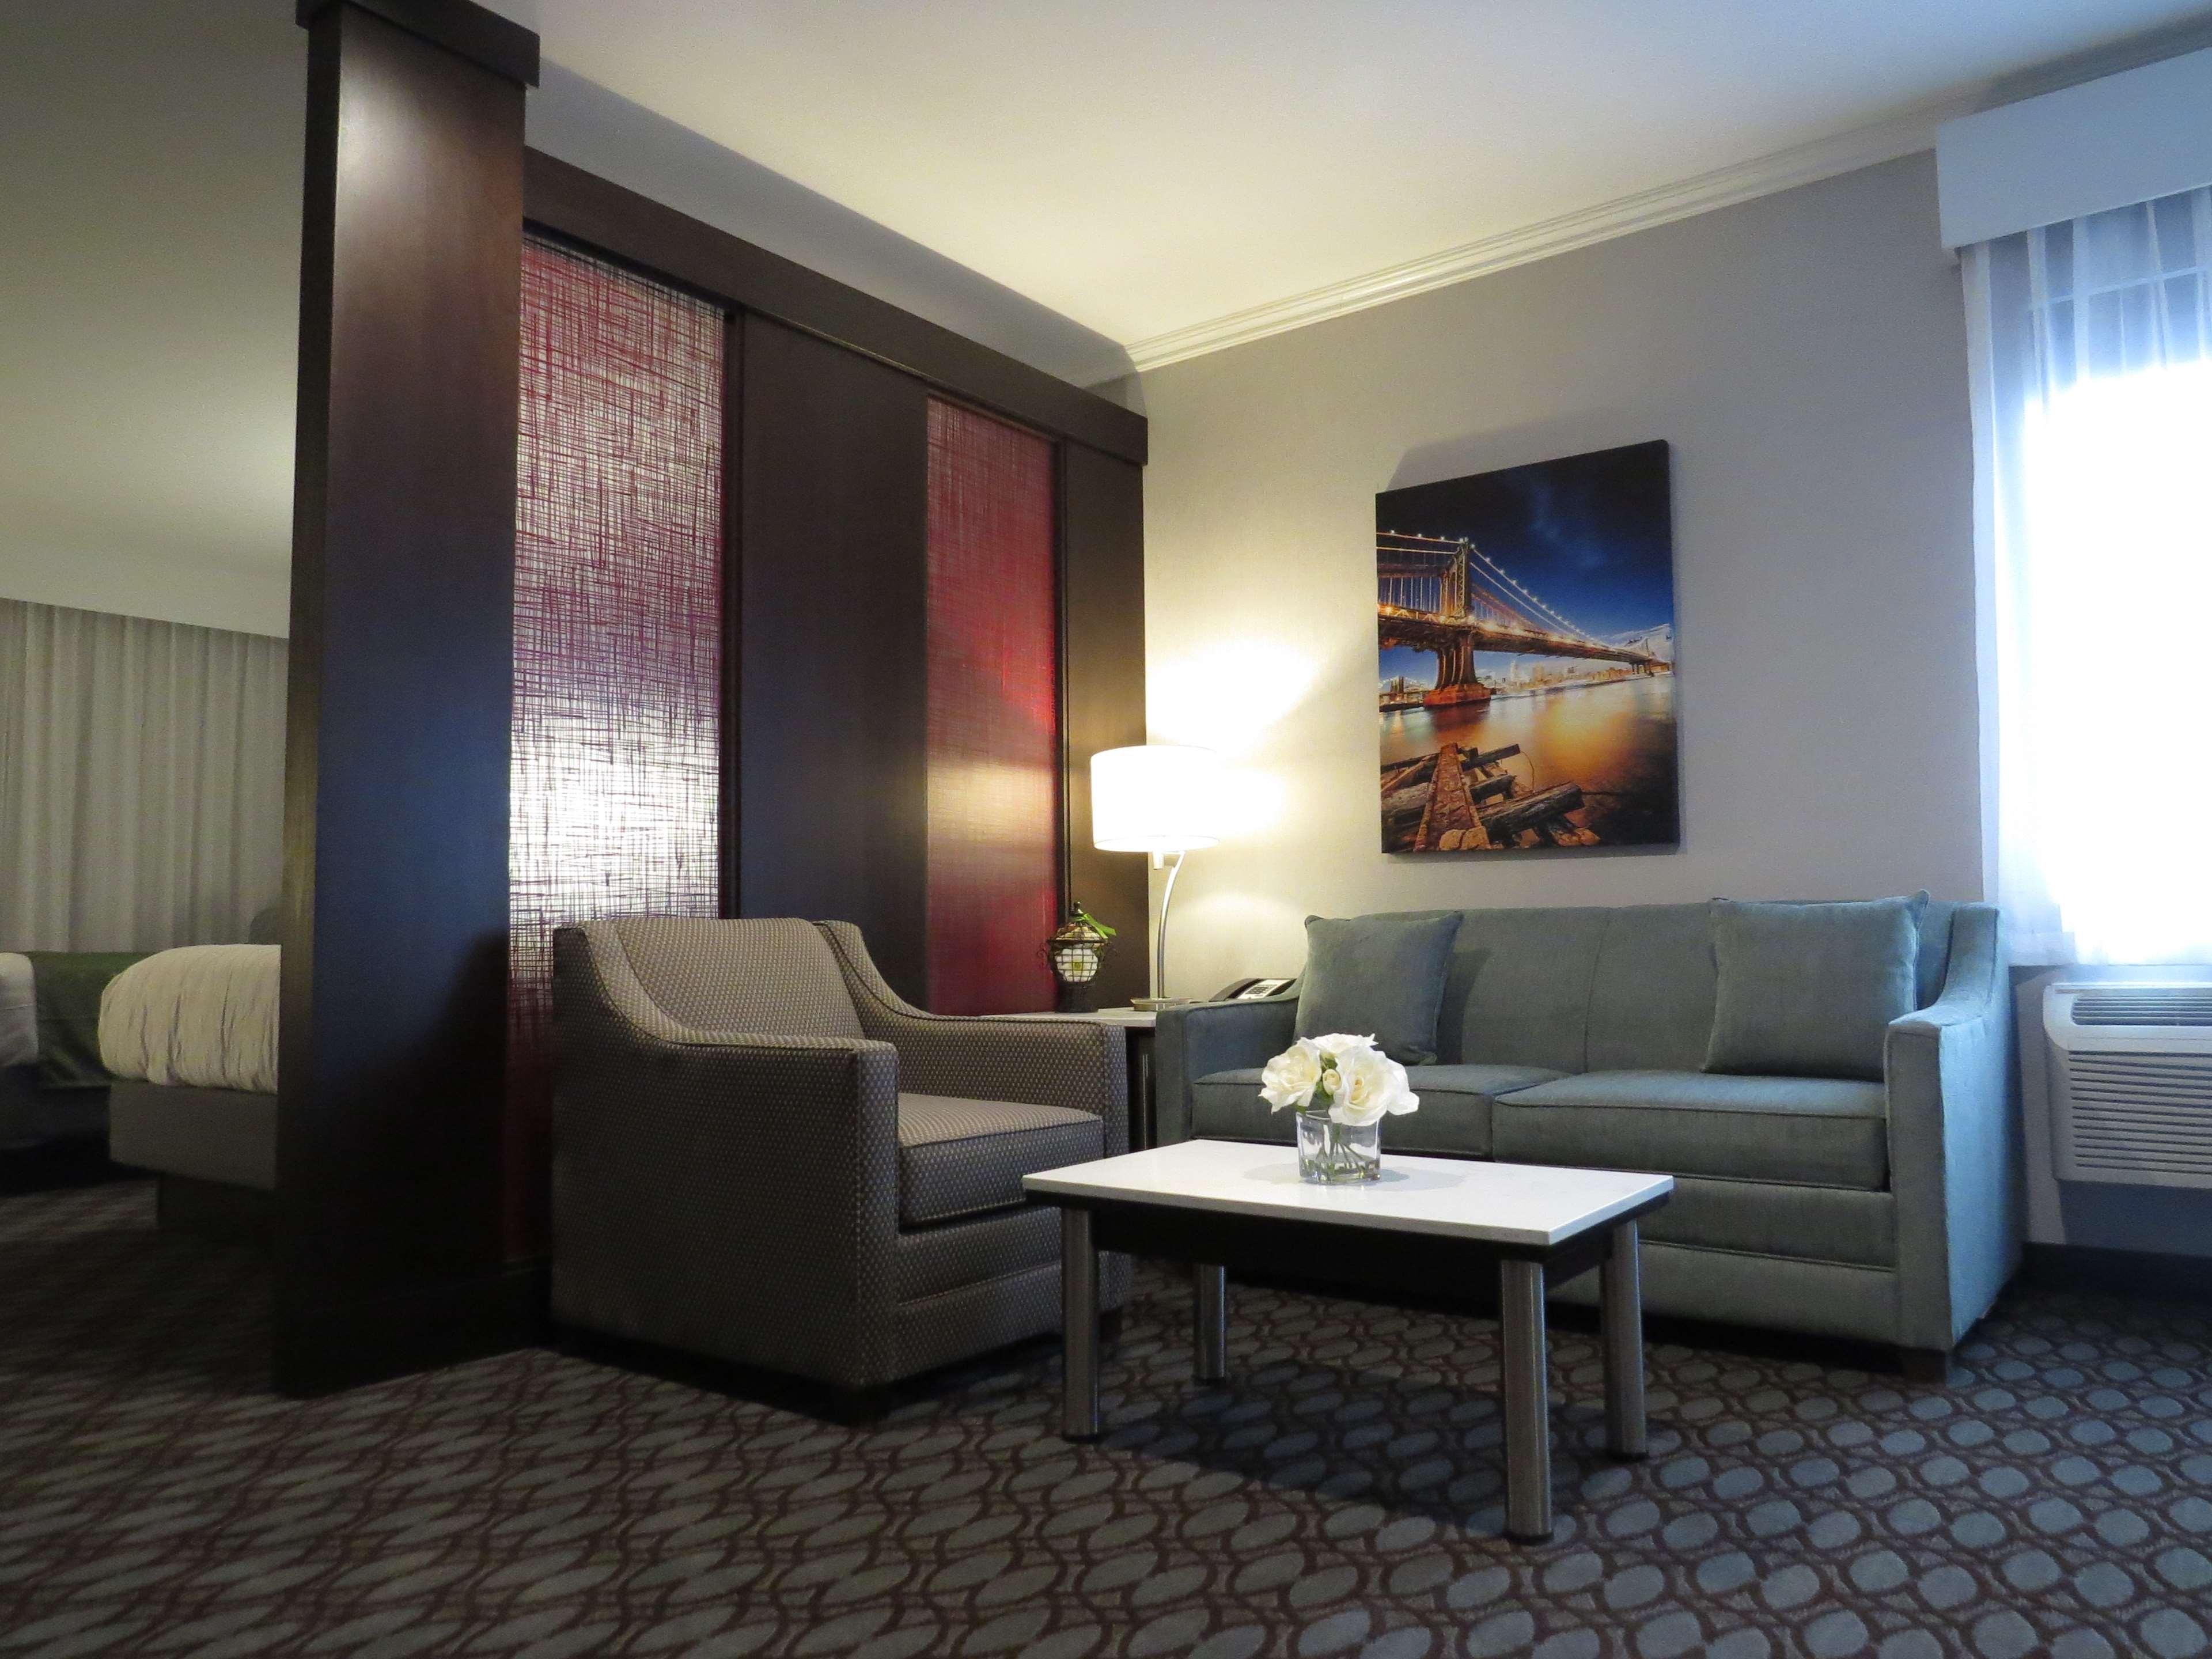 Best Western Premier NYC Gateway Hotel image 18